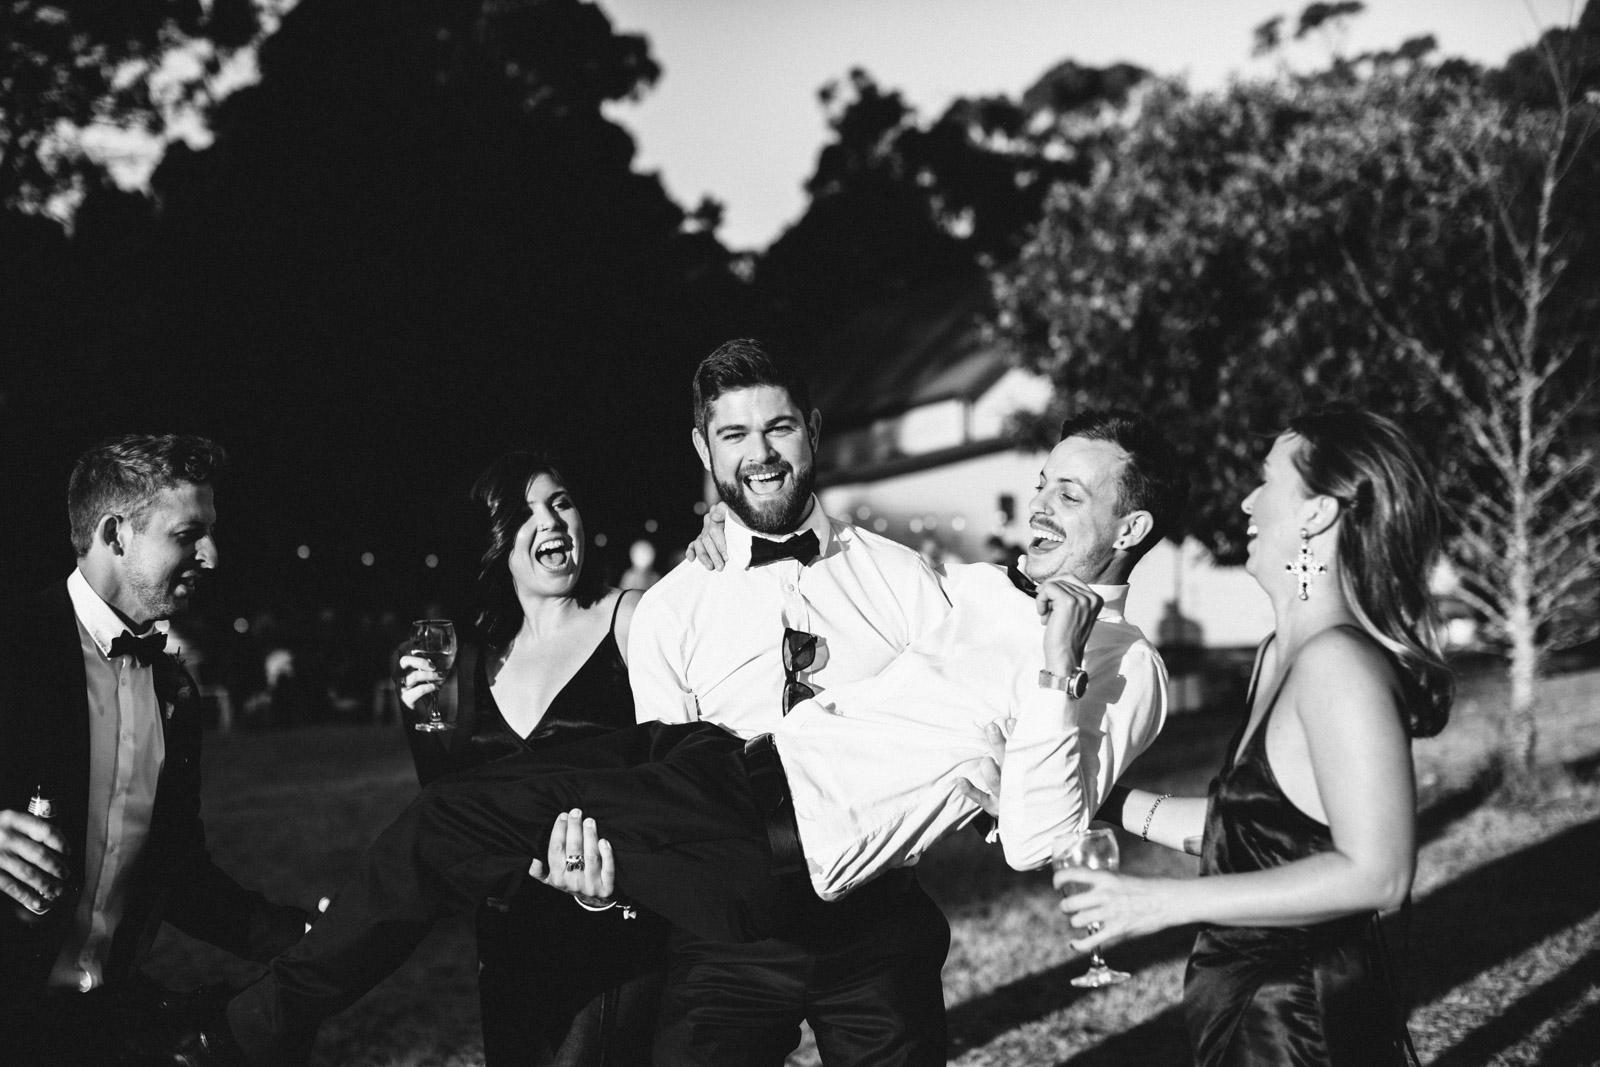 ZD-Melbourne Wedding Photographer-Dean Raphael-125.jpg